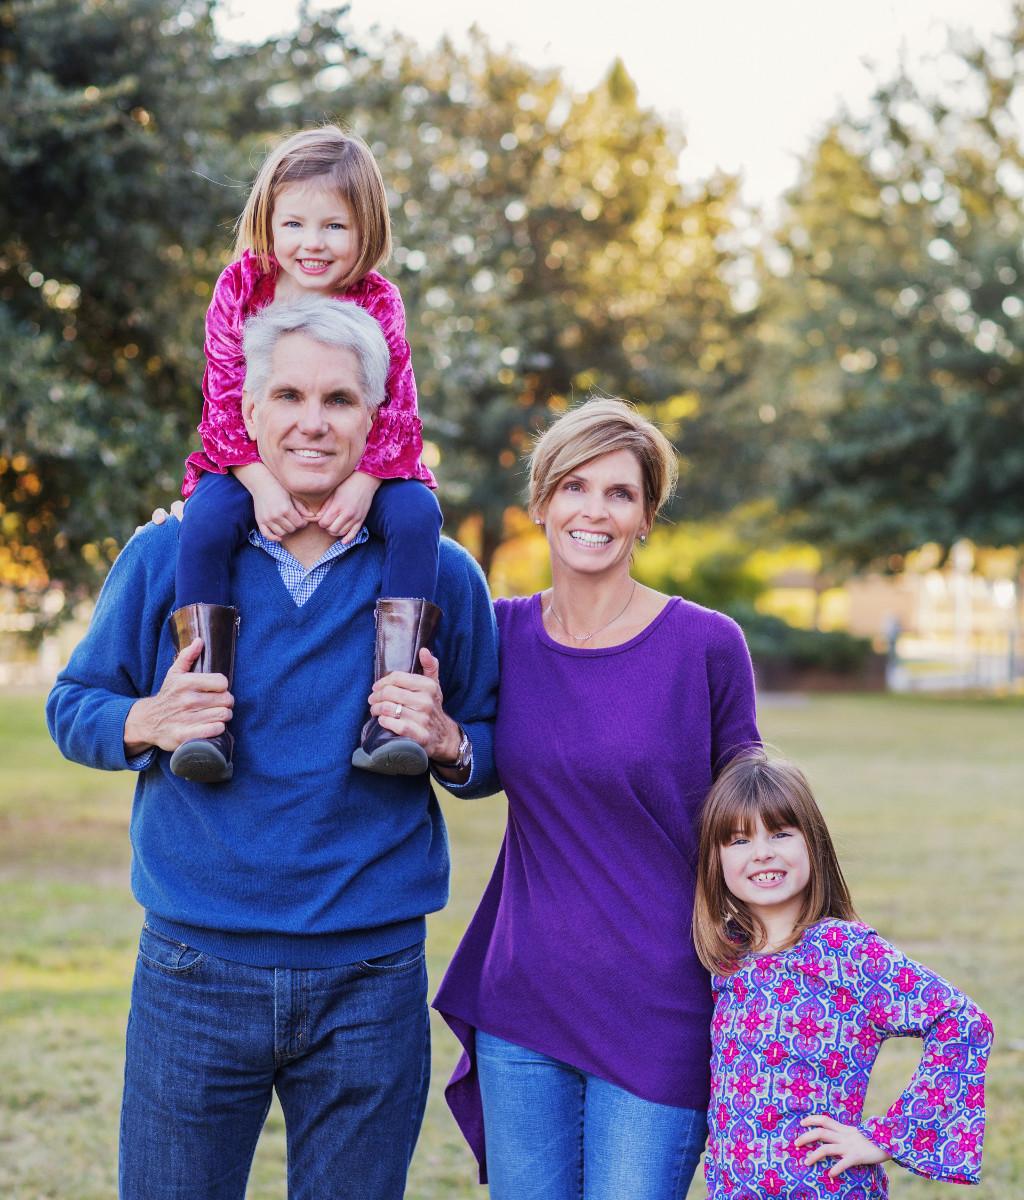 Kathy Terry and family. Courtesy photo.